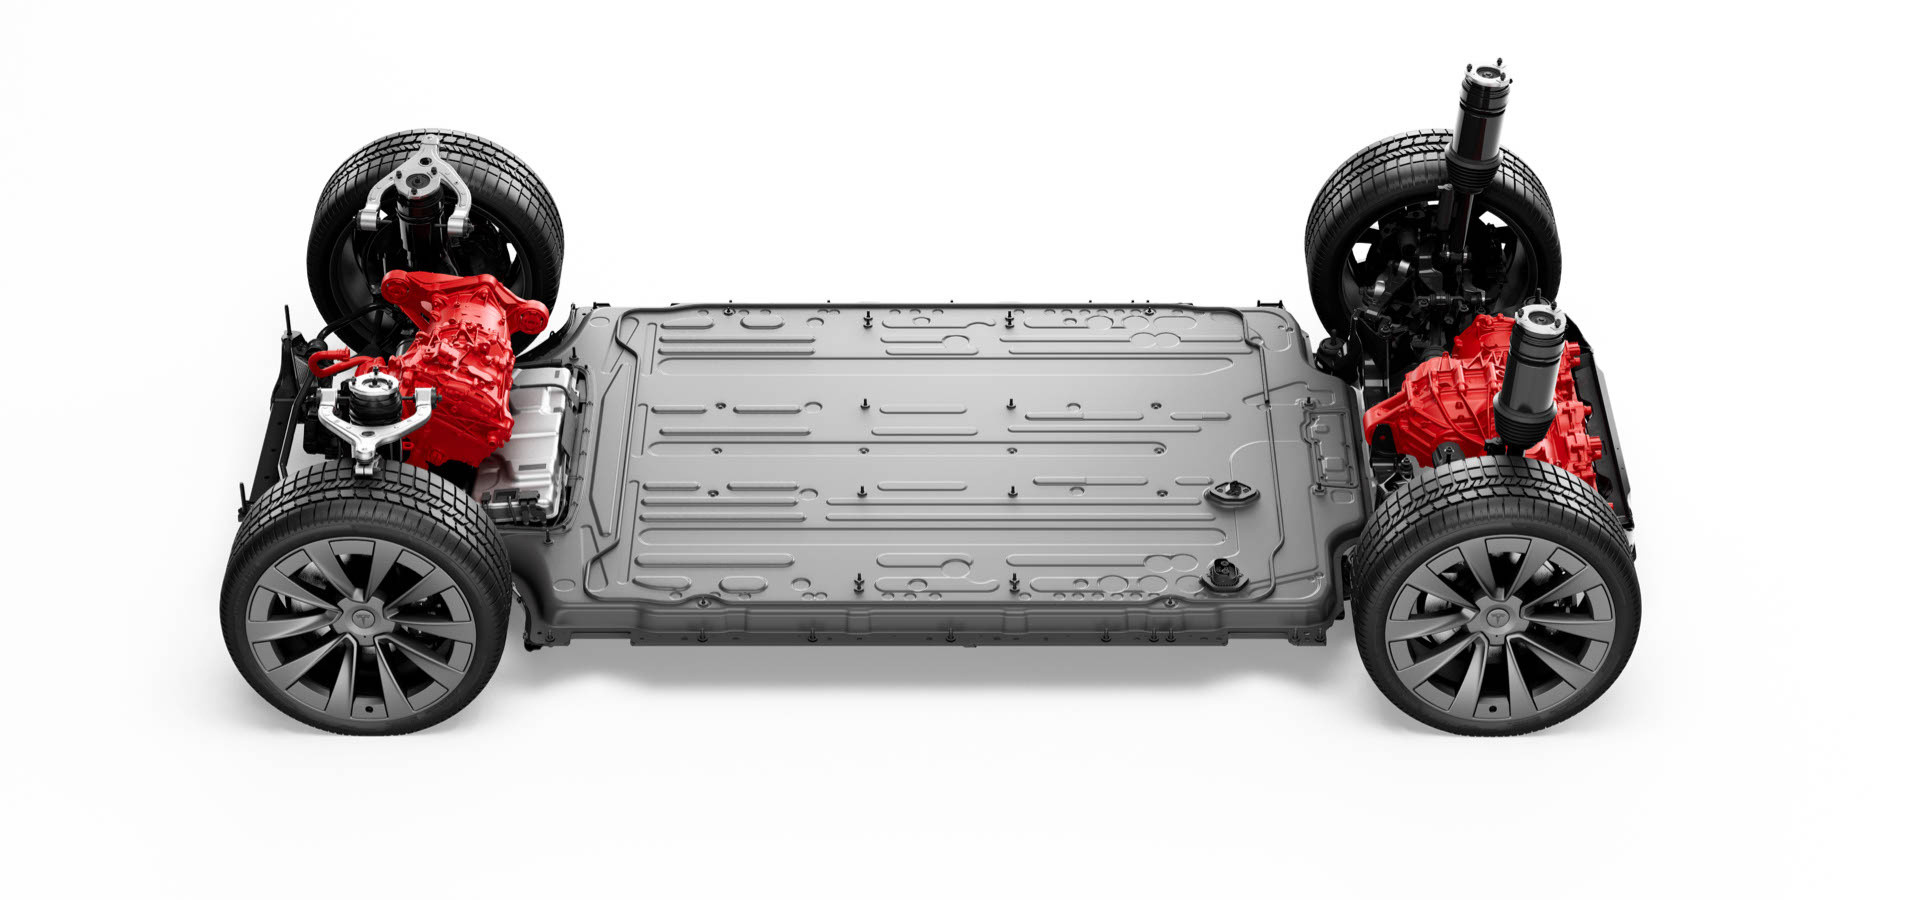 Model X Tri Motor All-Wheel Drive